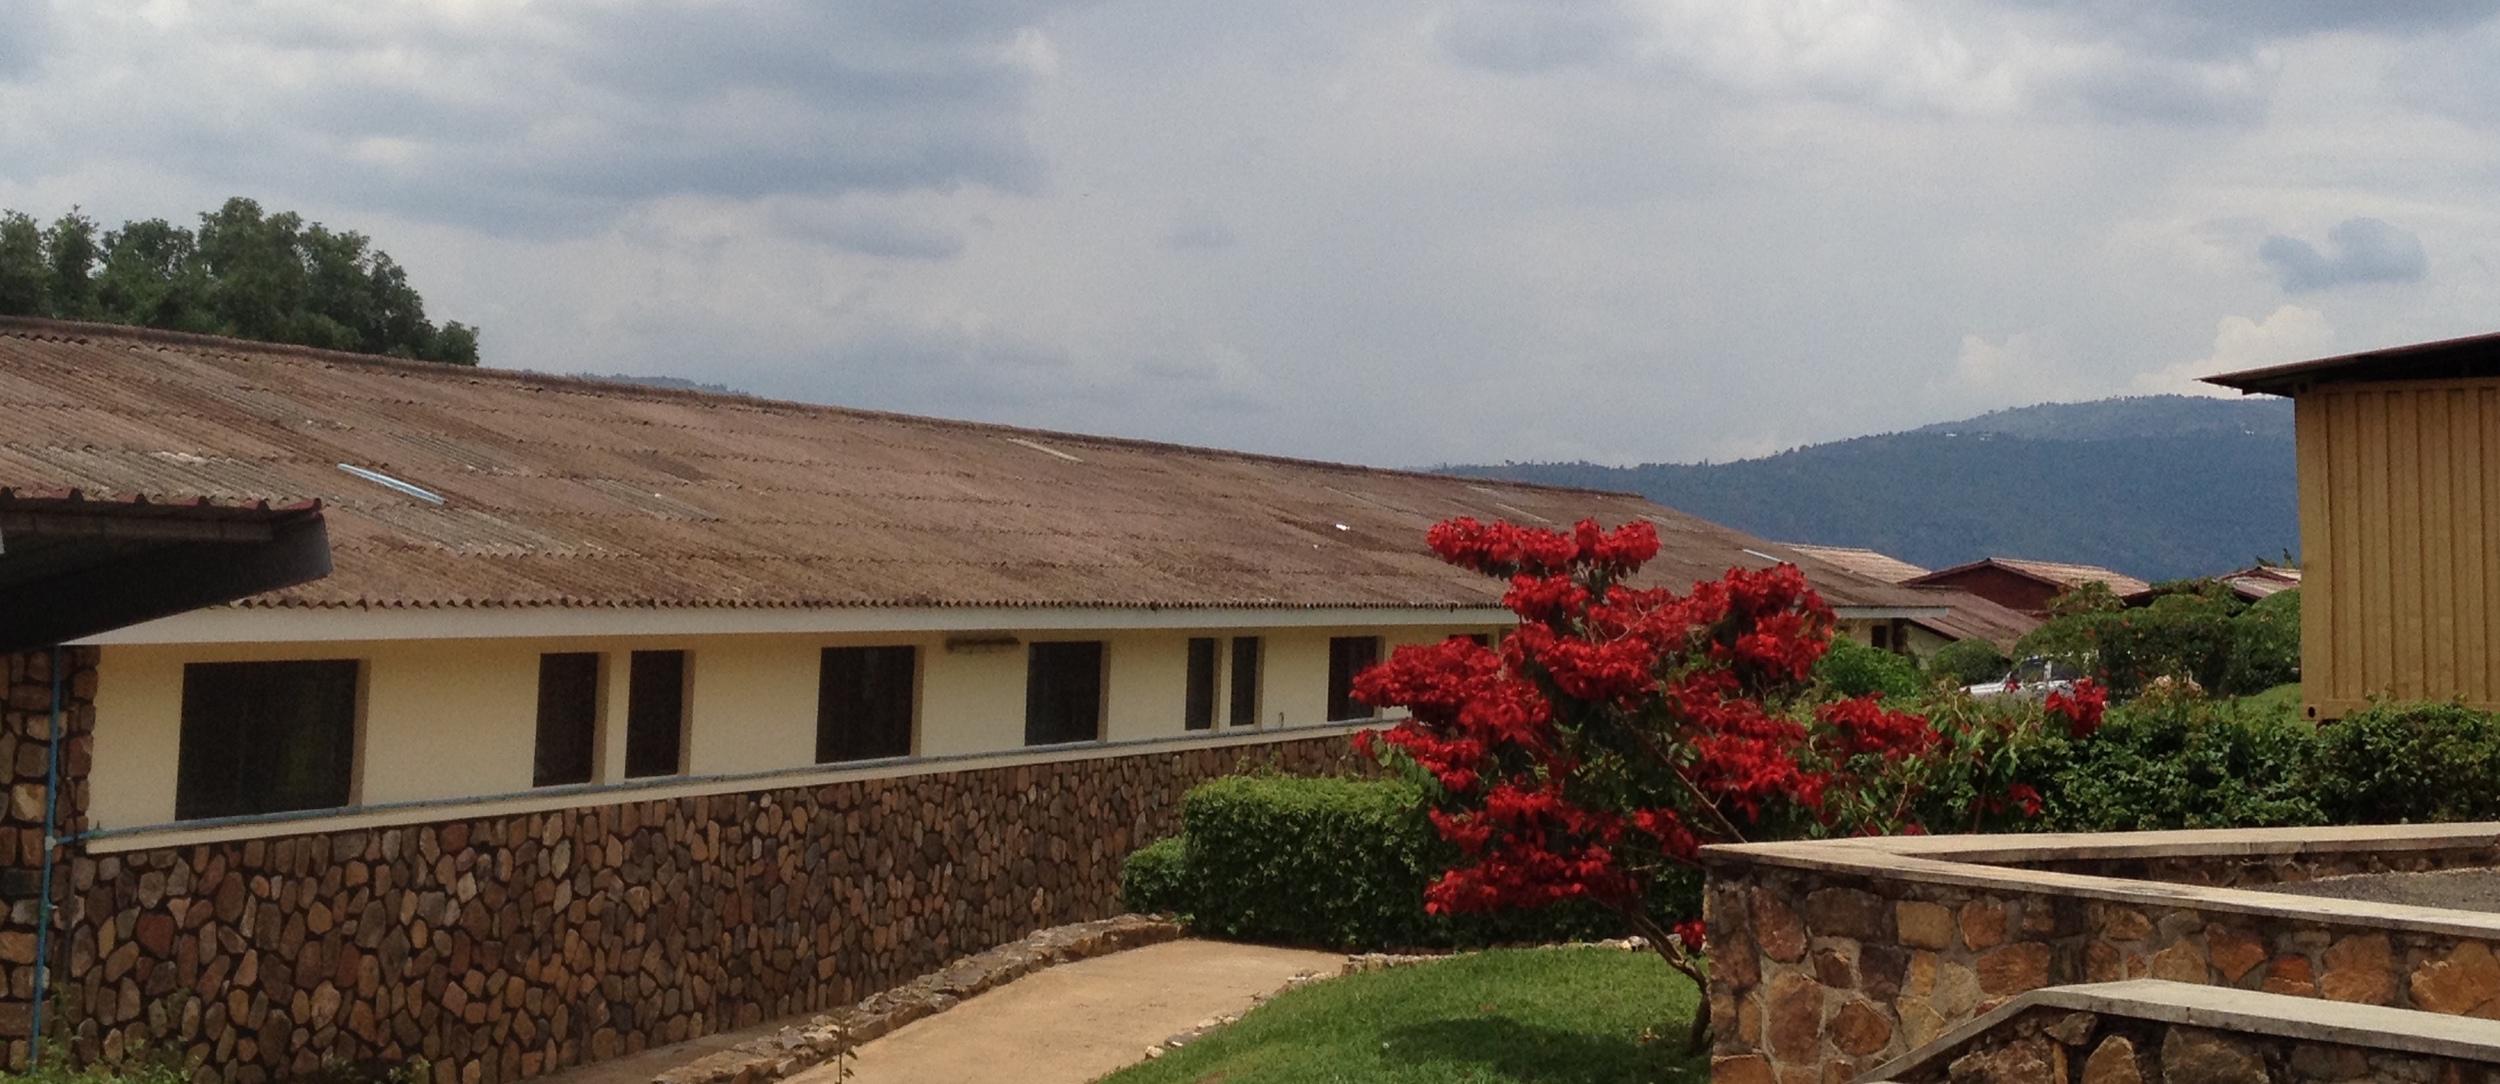 The CHUK clinic in Kigali